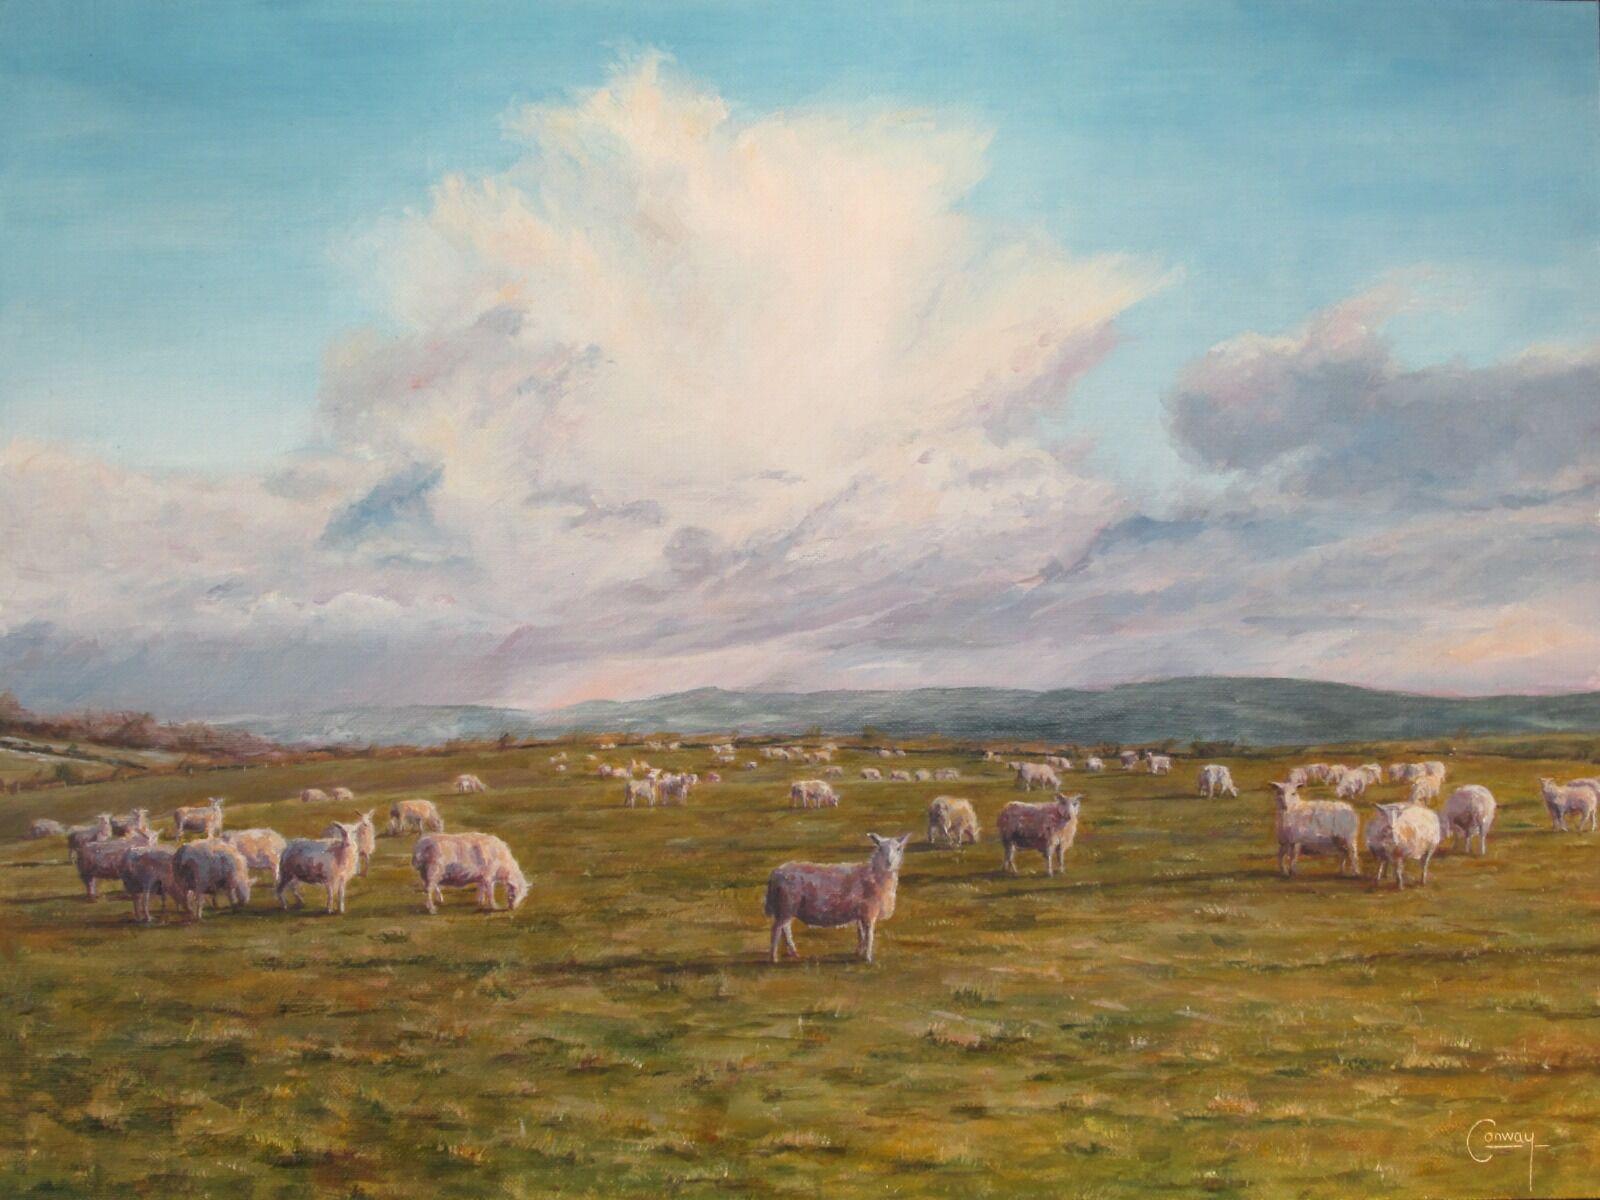 Surprised Sheep, Llansawel, Carmarthenshire